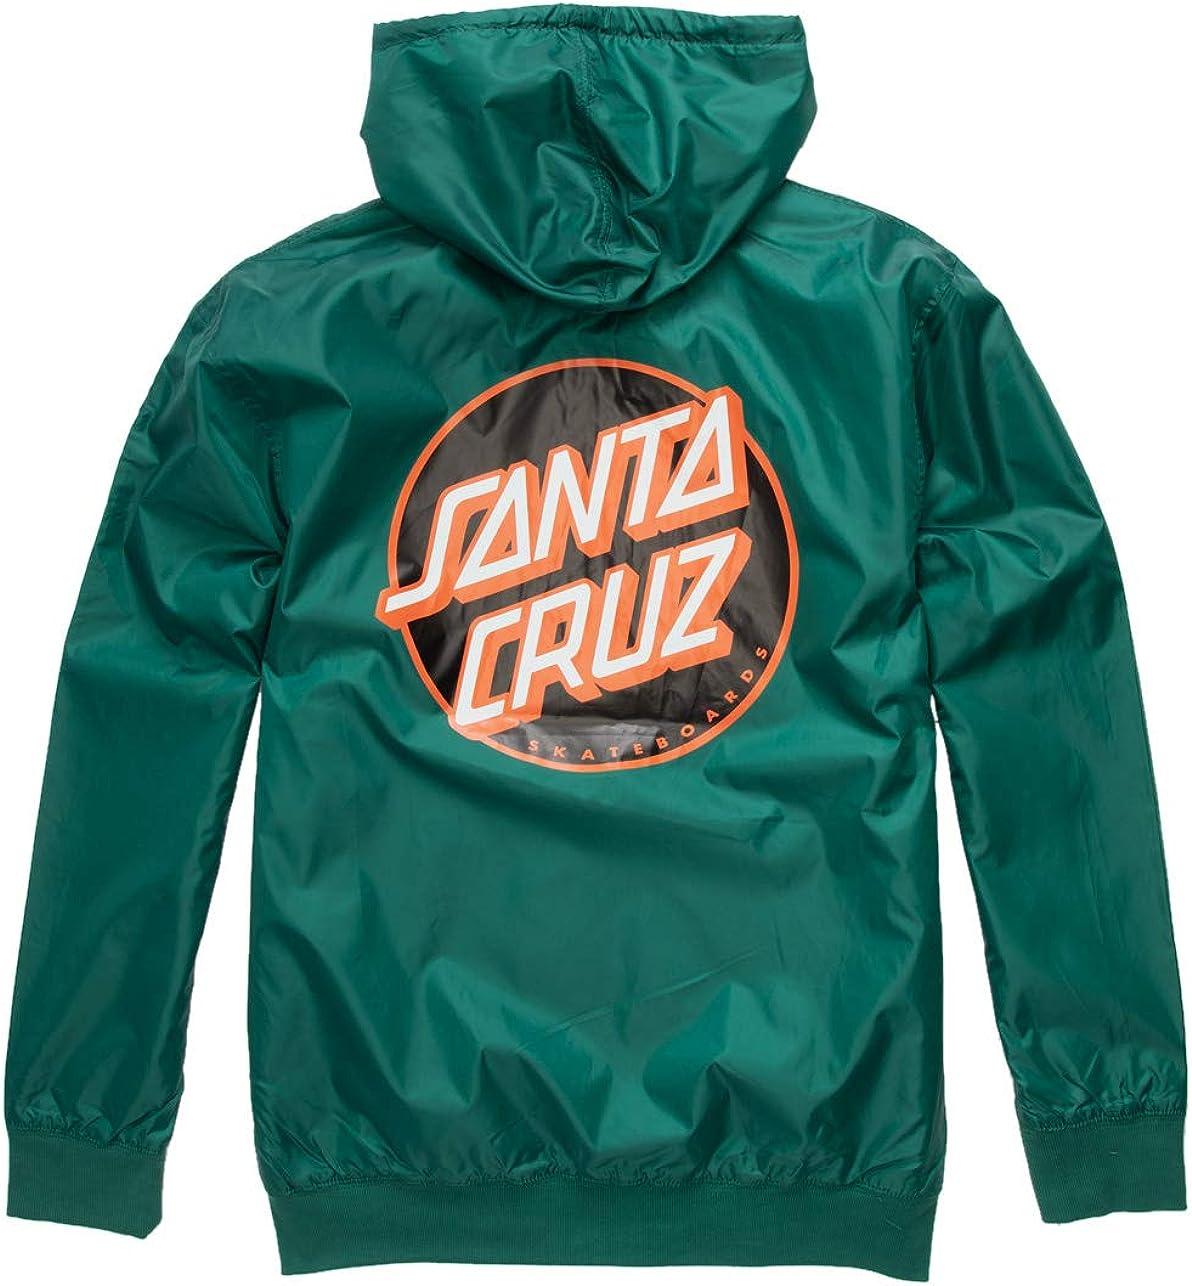 Santa Cruz Dot Windbreaker Jacket - Forest Green - SM